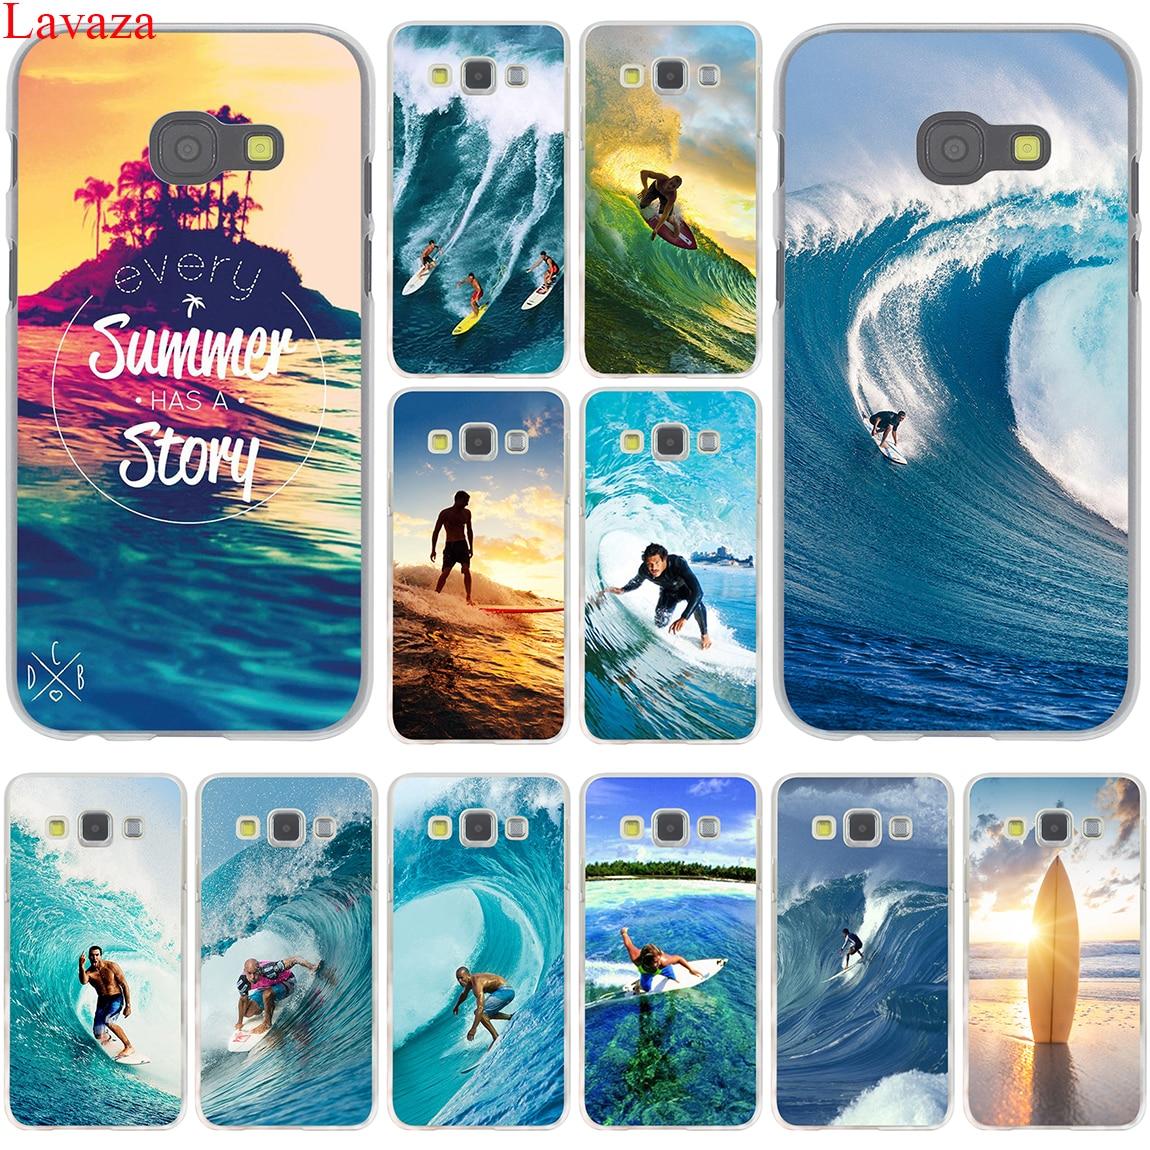 Galleria fotografica Lavaza Sea wave surf summer surfing ocean Hard for Samsung Galaxy A3 A5 A7 A8 2015 2016 2017 2018 Grand Prime Note 8 5 4 3 2